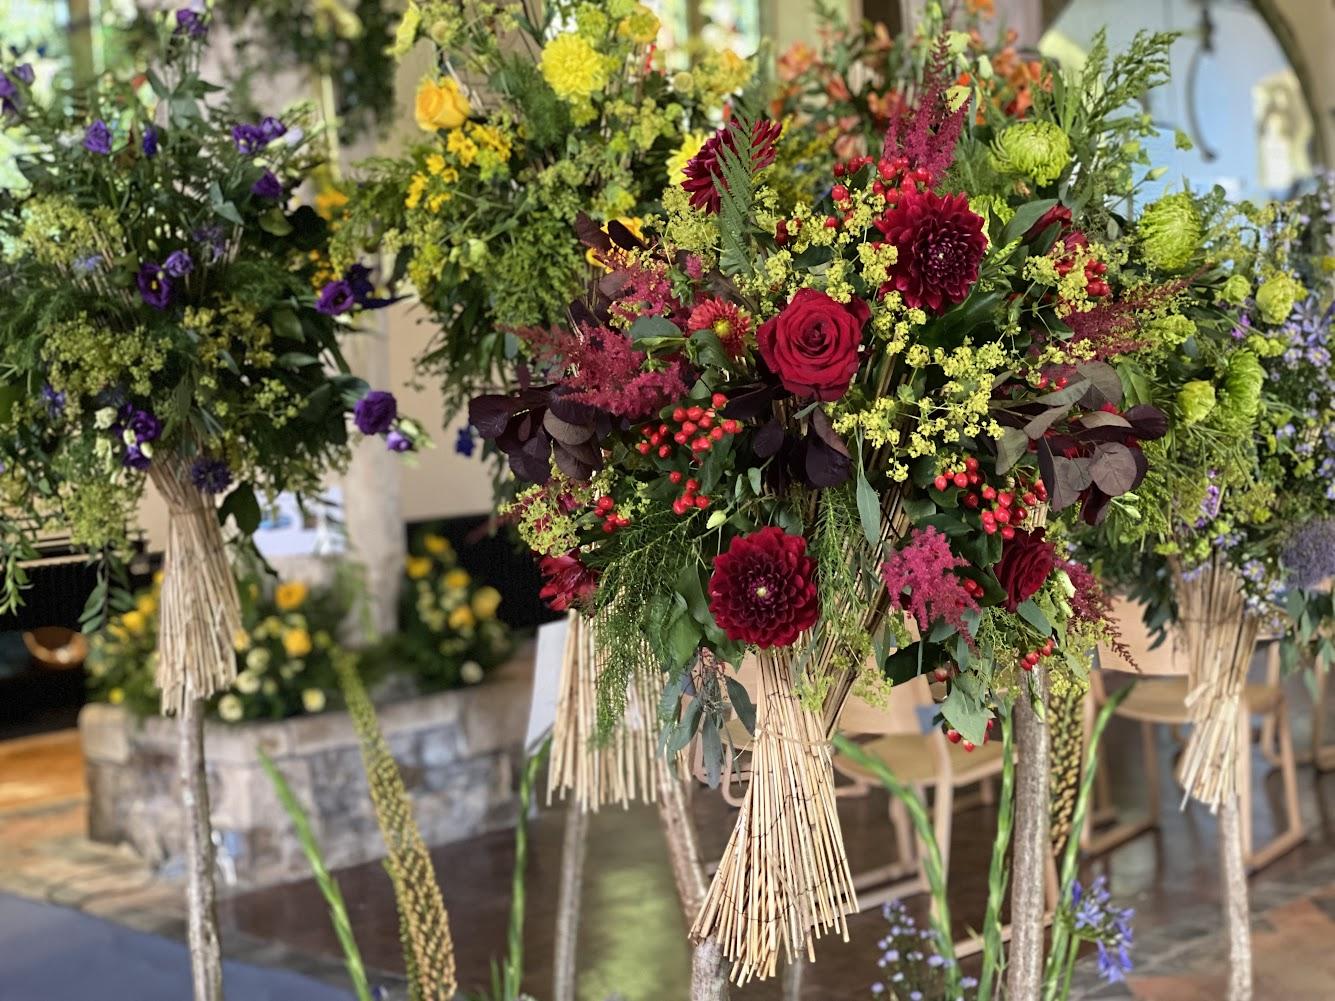 St Mildreds Church Flower Festival 2021 Tenterden